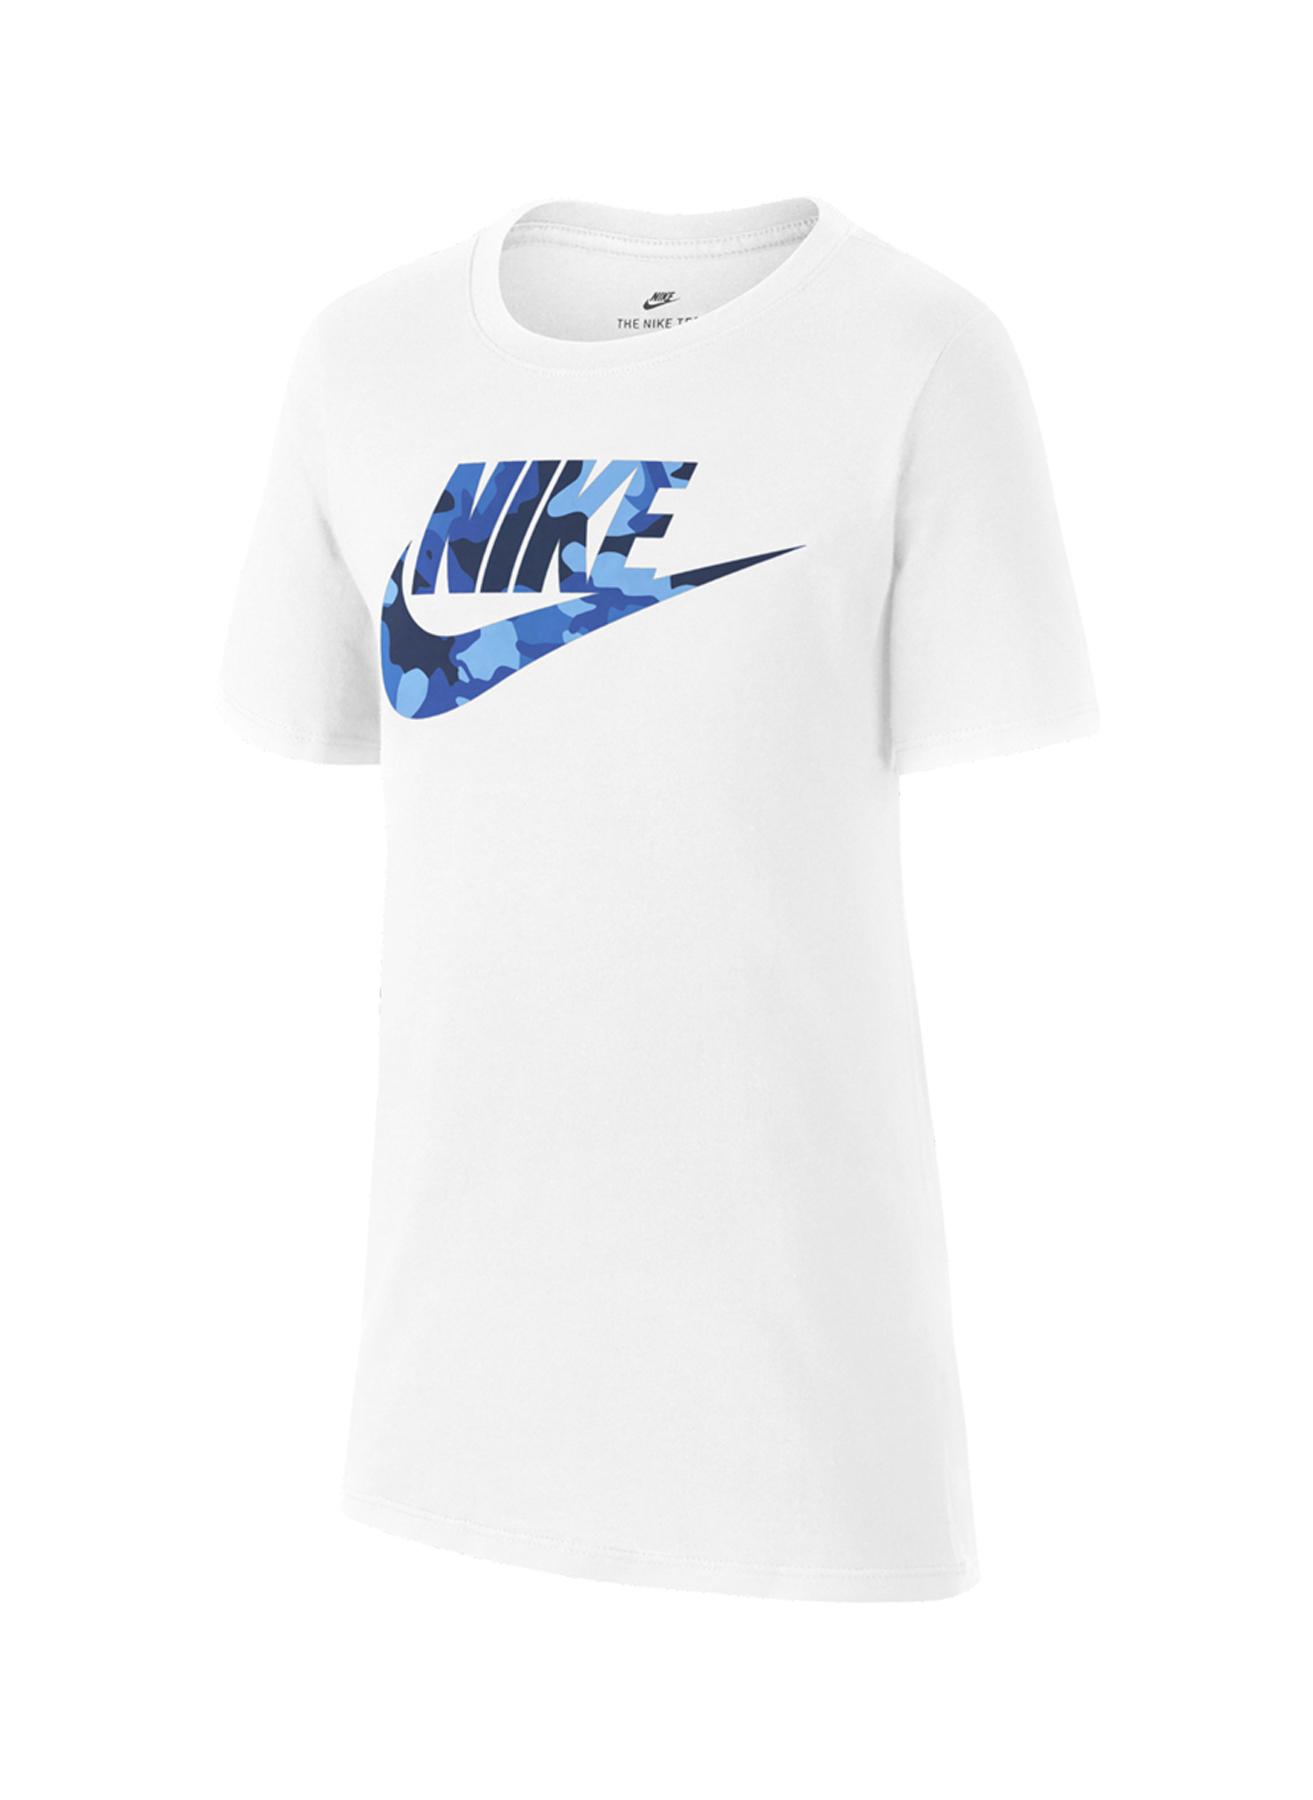 Nike T-Shirt L 5001823409001 Ürün Resmi